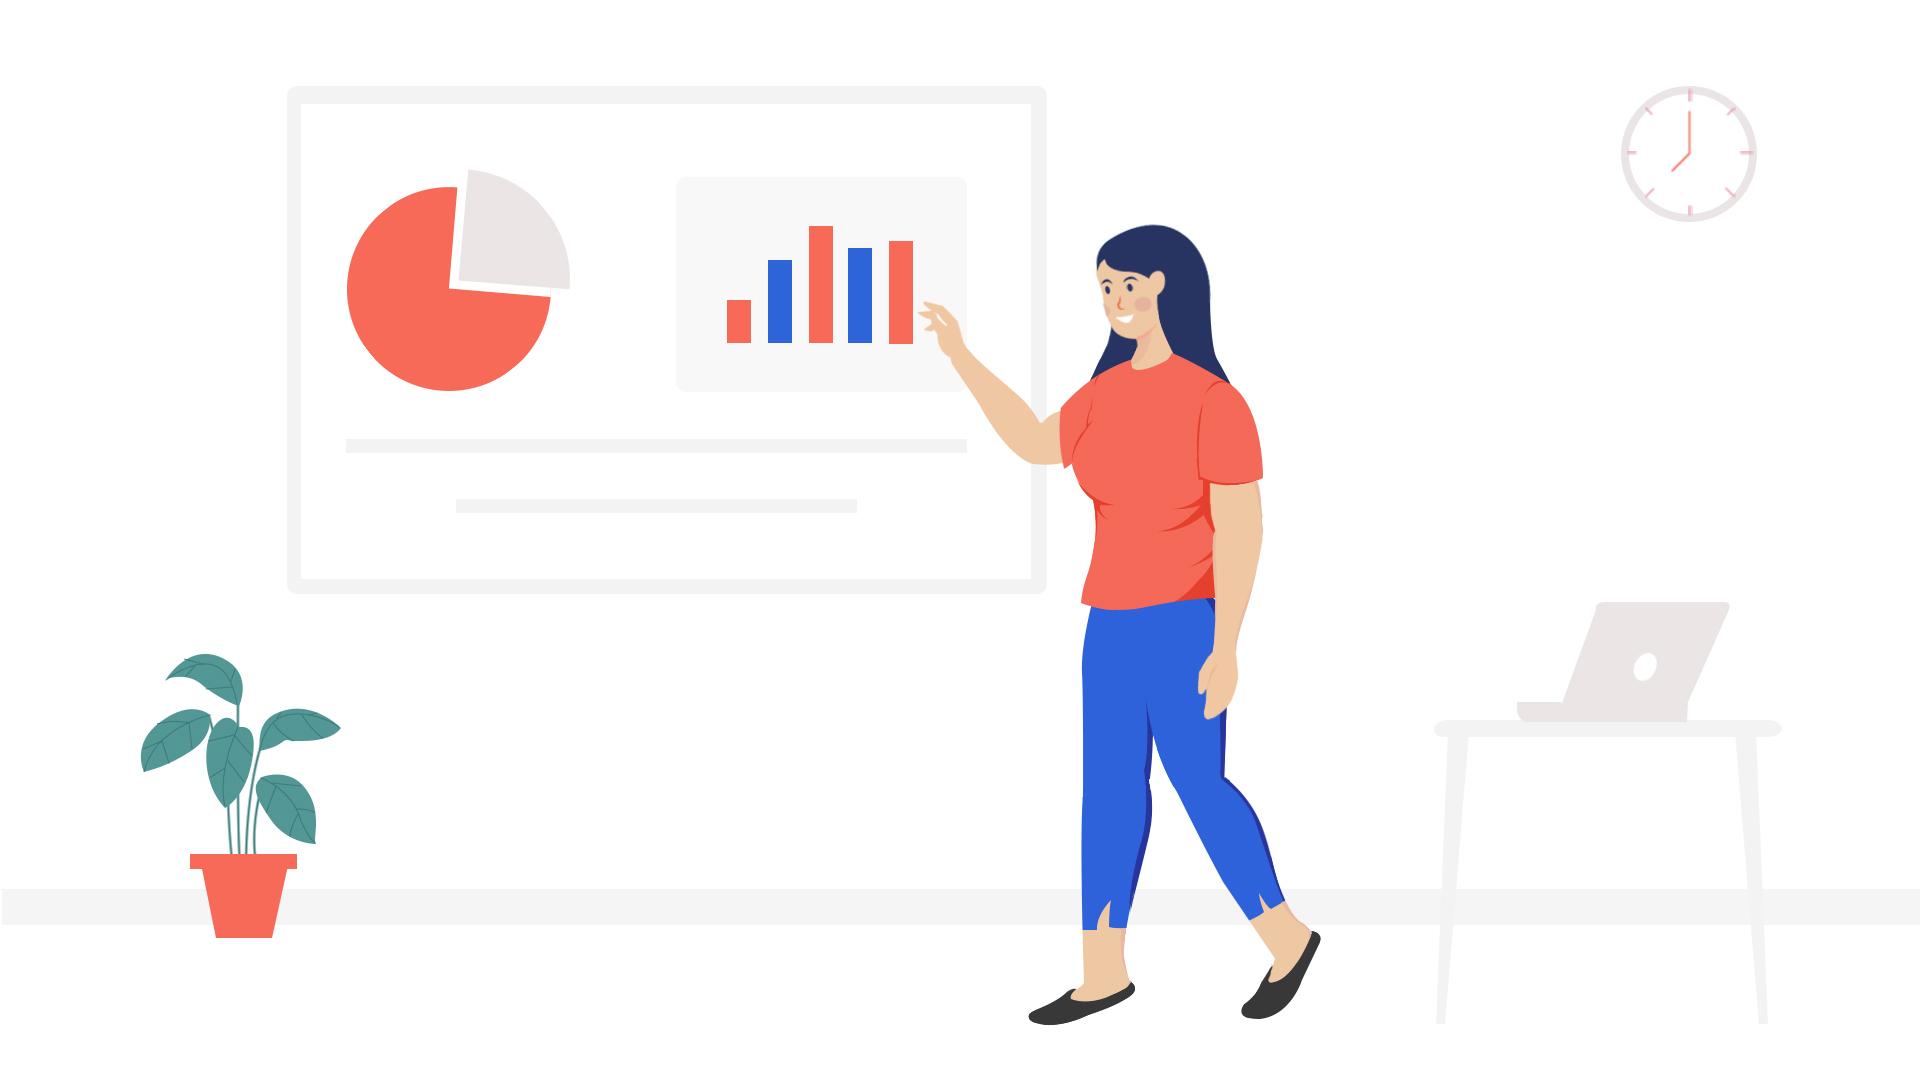 Analytics and evaluation